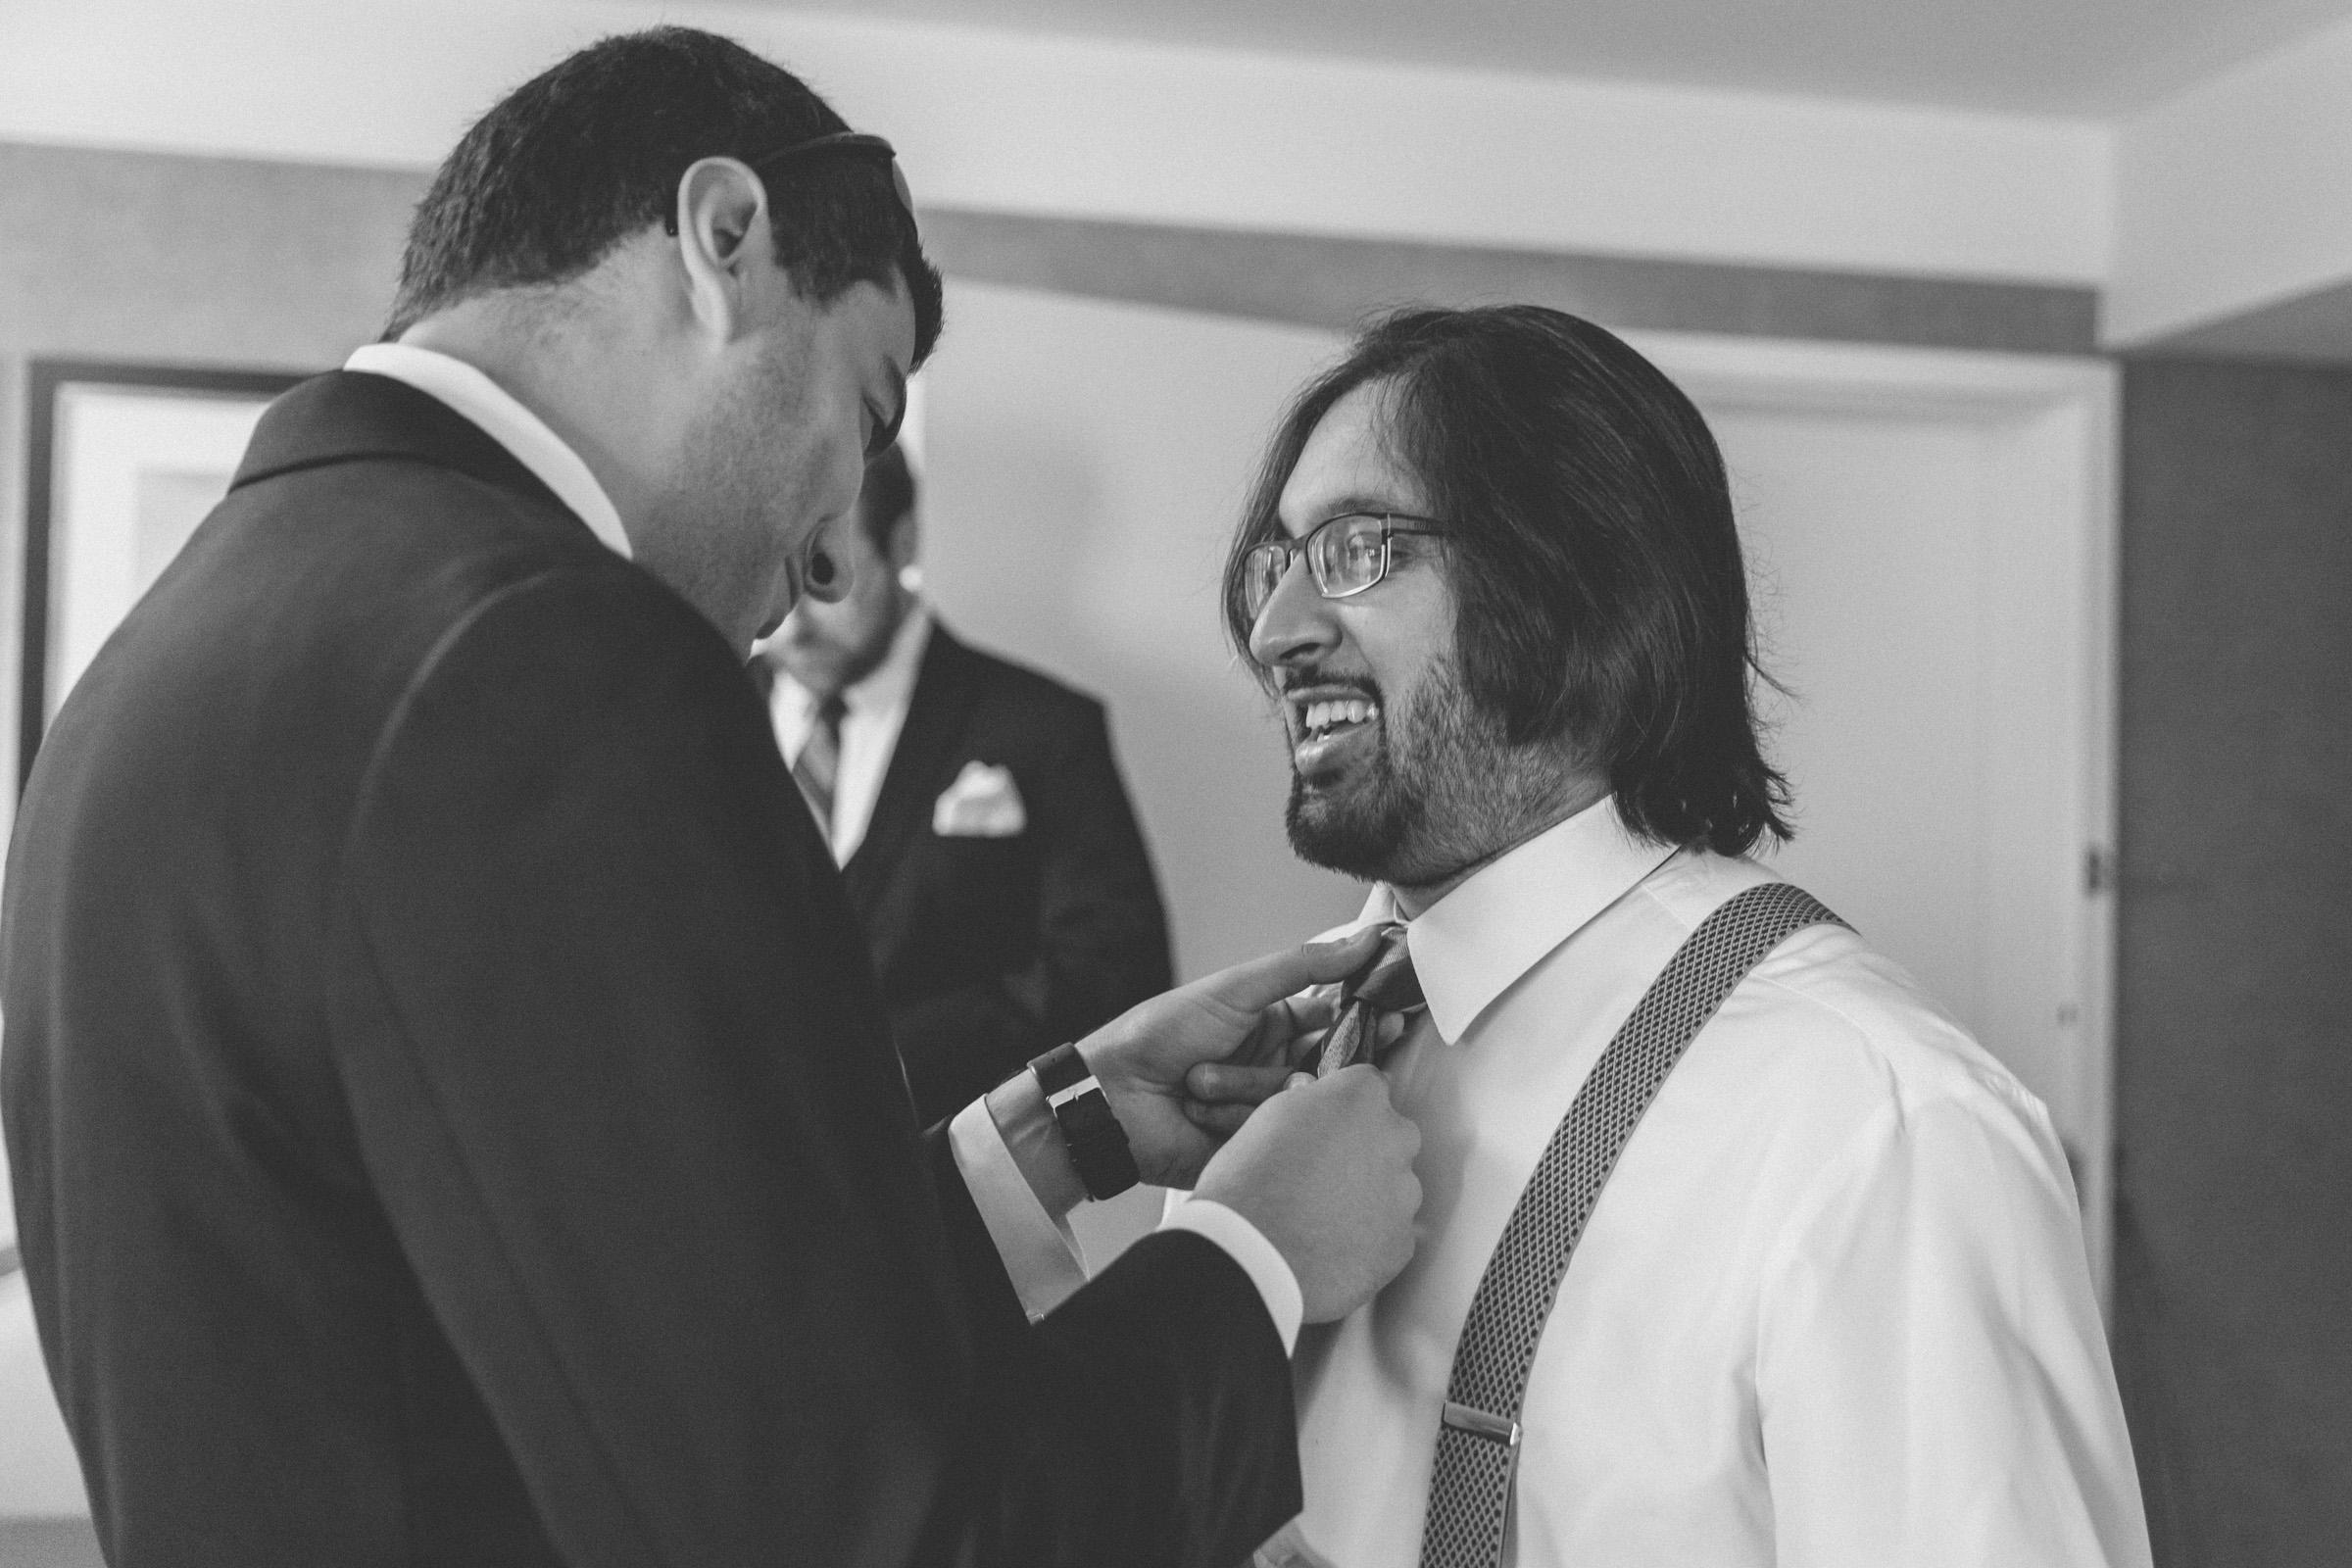 Groomsman fixes groom's tie - Estate at Florentine Gardens wedding - Hudson Valley Wedding - Kelsey & Anish's wedding - Amy Sims Photography